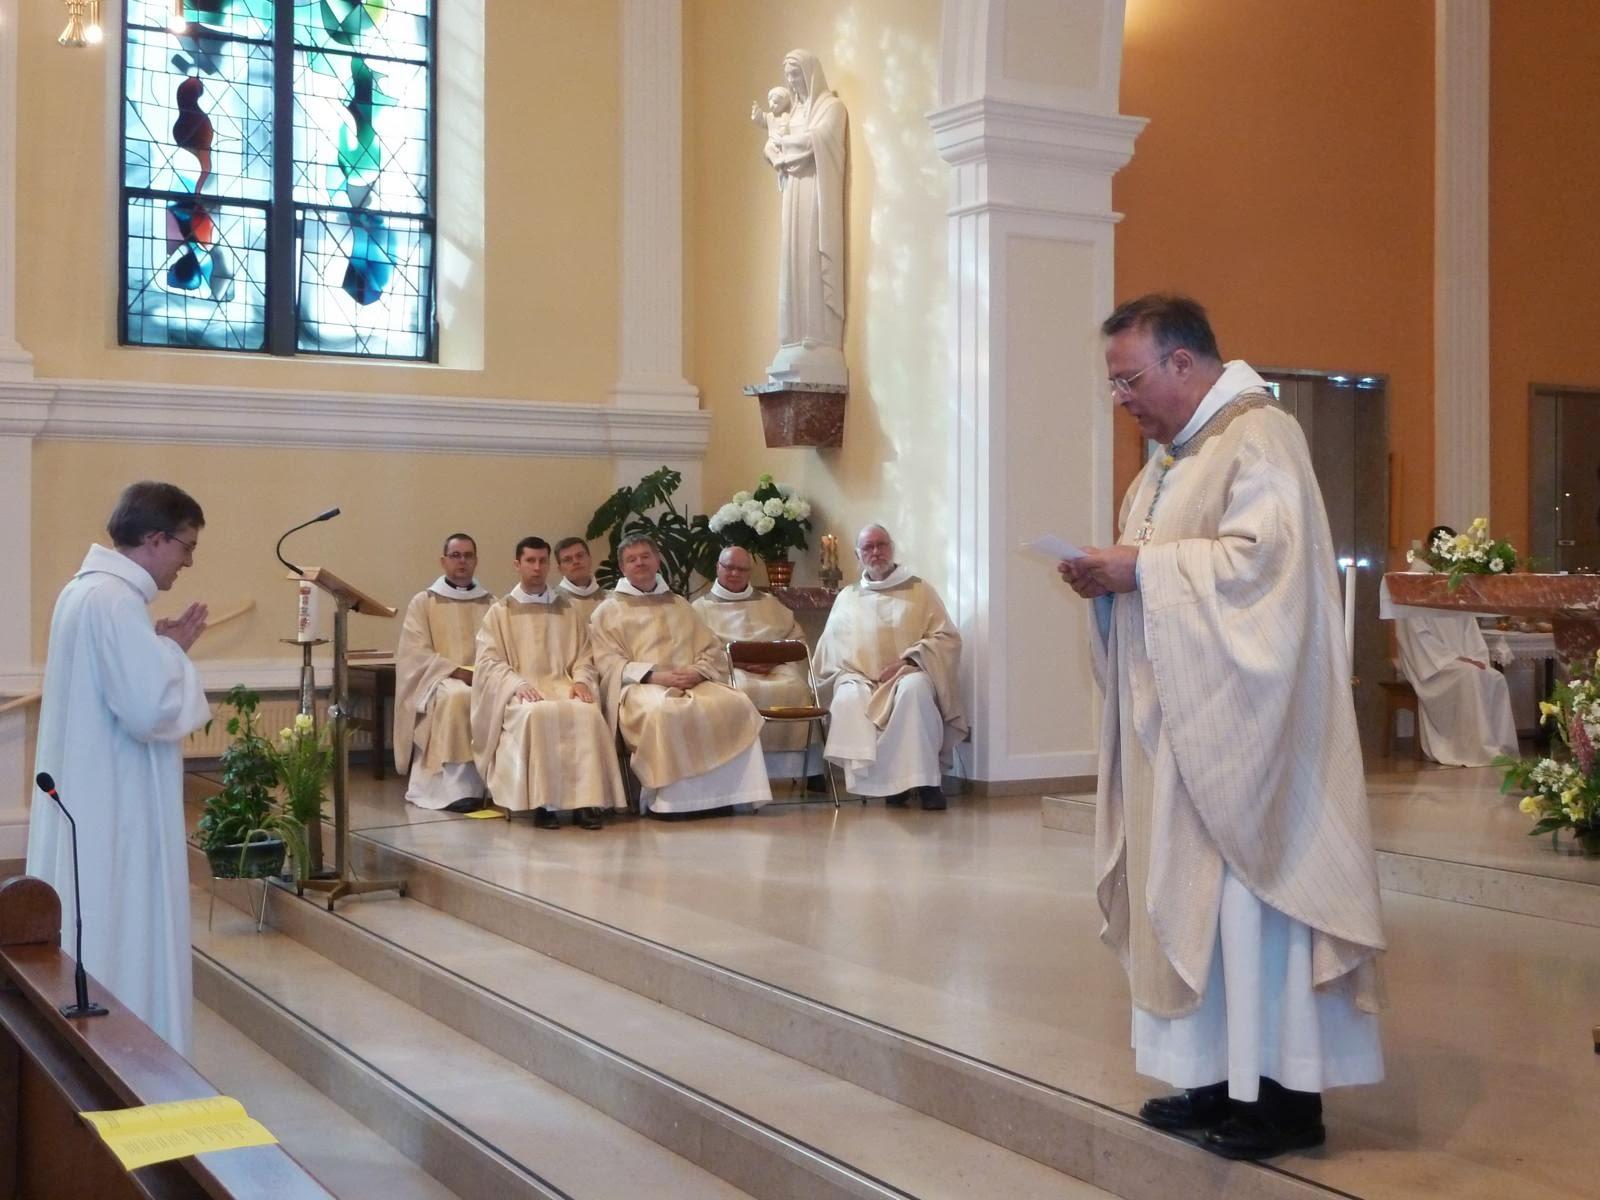 Séminaire Sainte Marie Majeure Dioc¨se de Strasbourg juin 2013